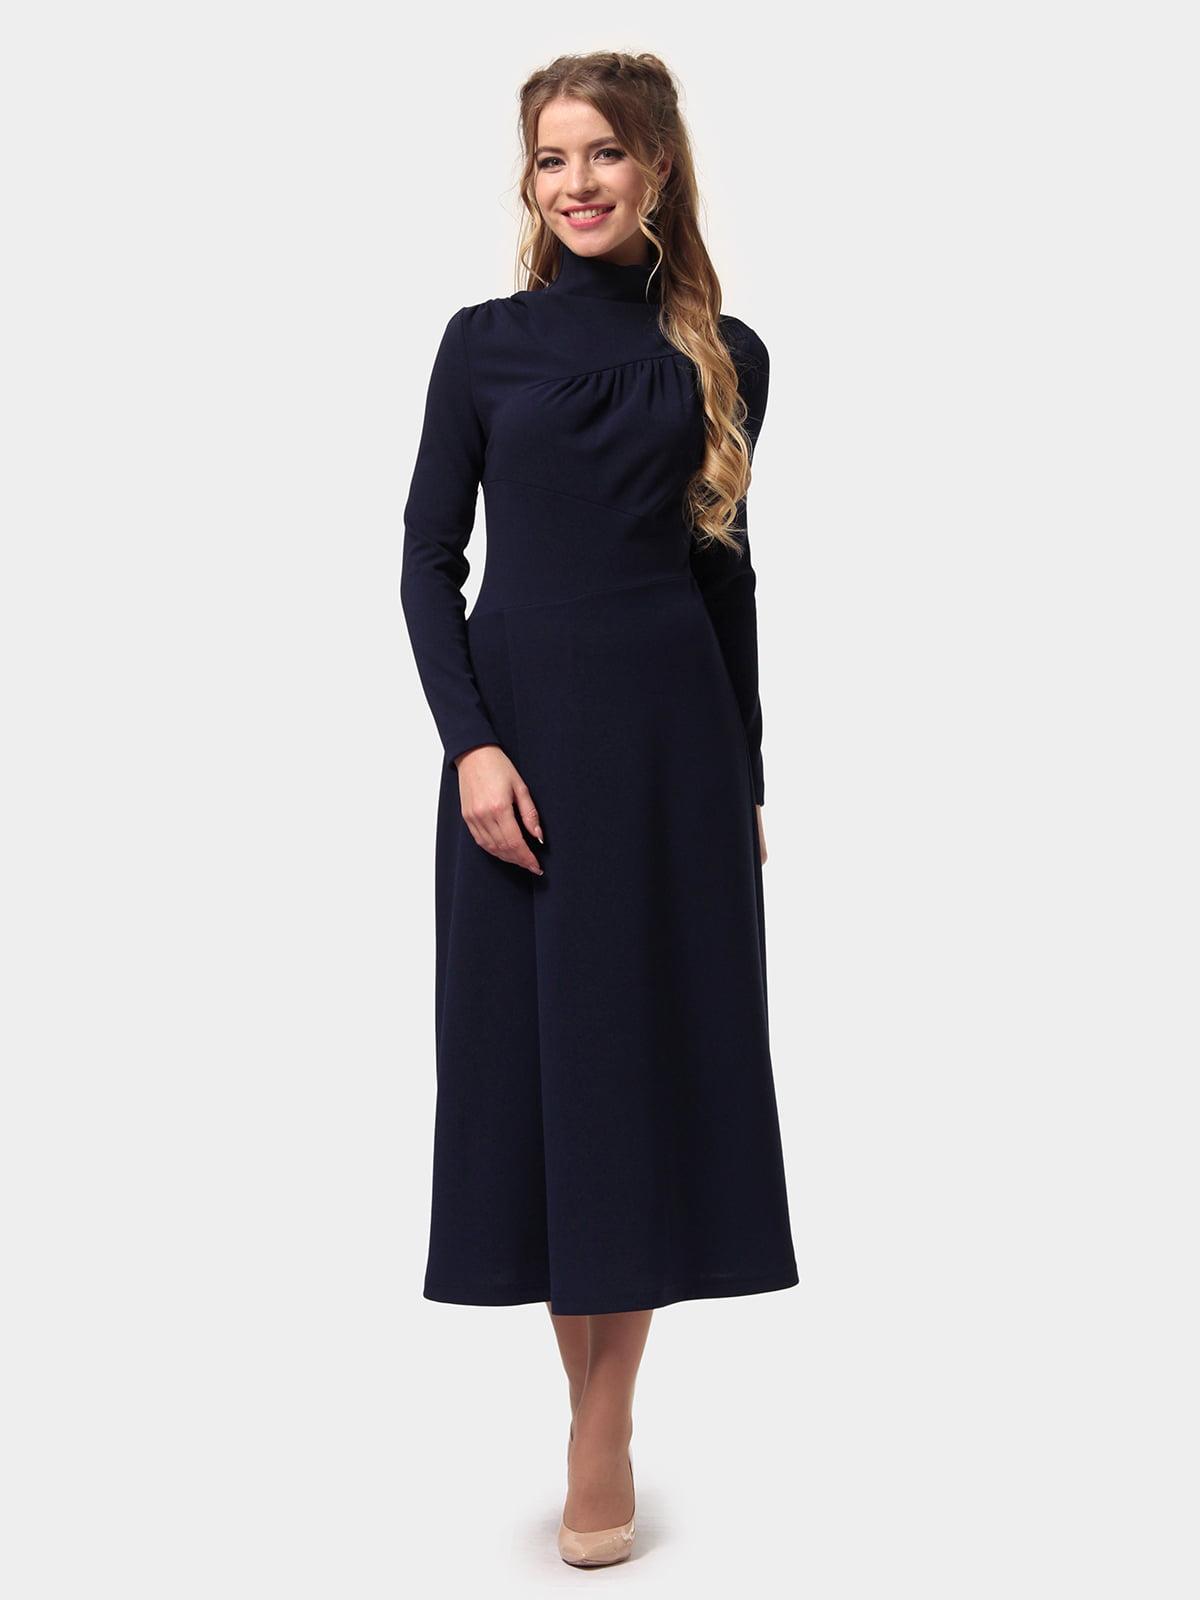 Платье темно-синее   4775706   фото 2